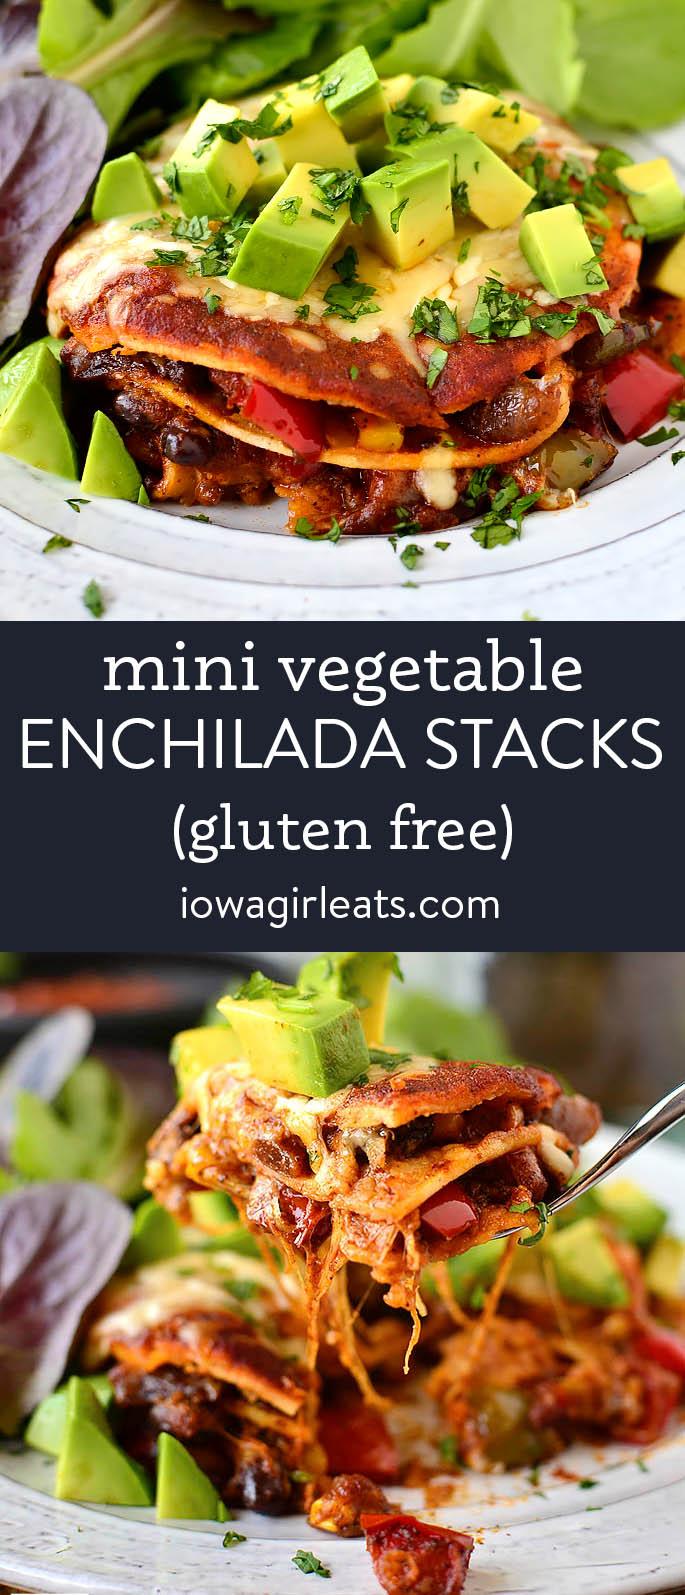 photo collage of vegetarian enchilada stacks